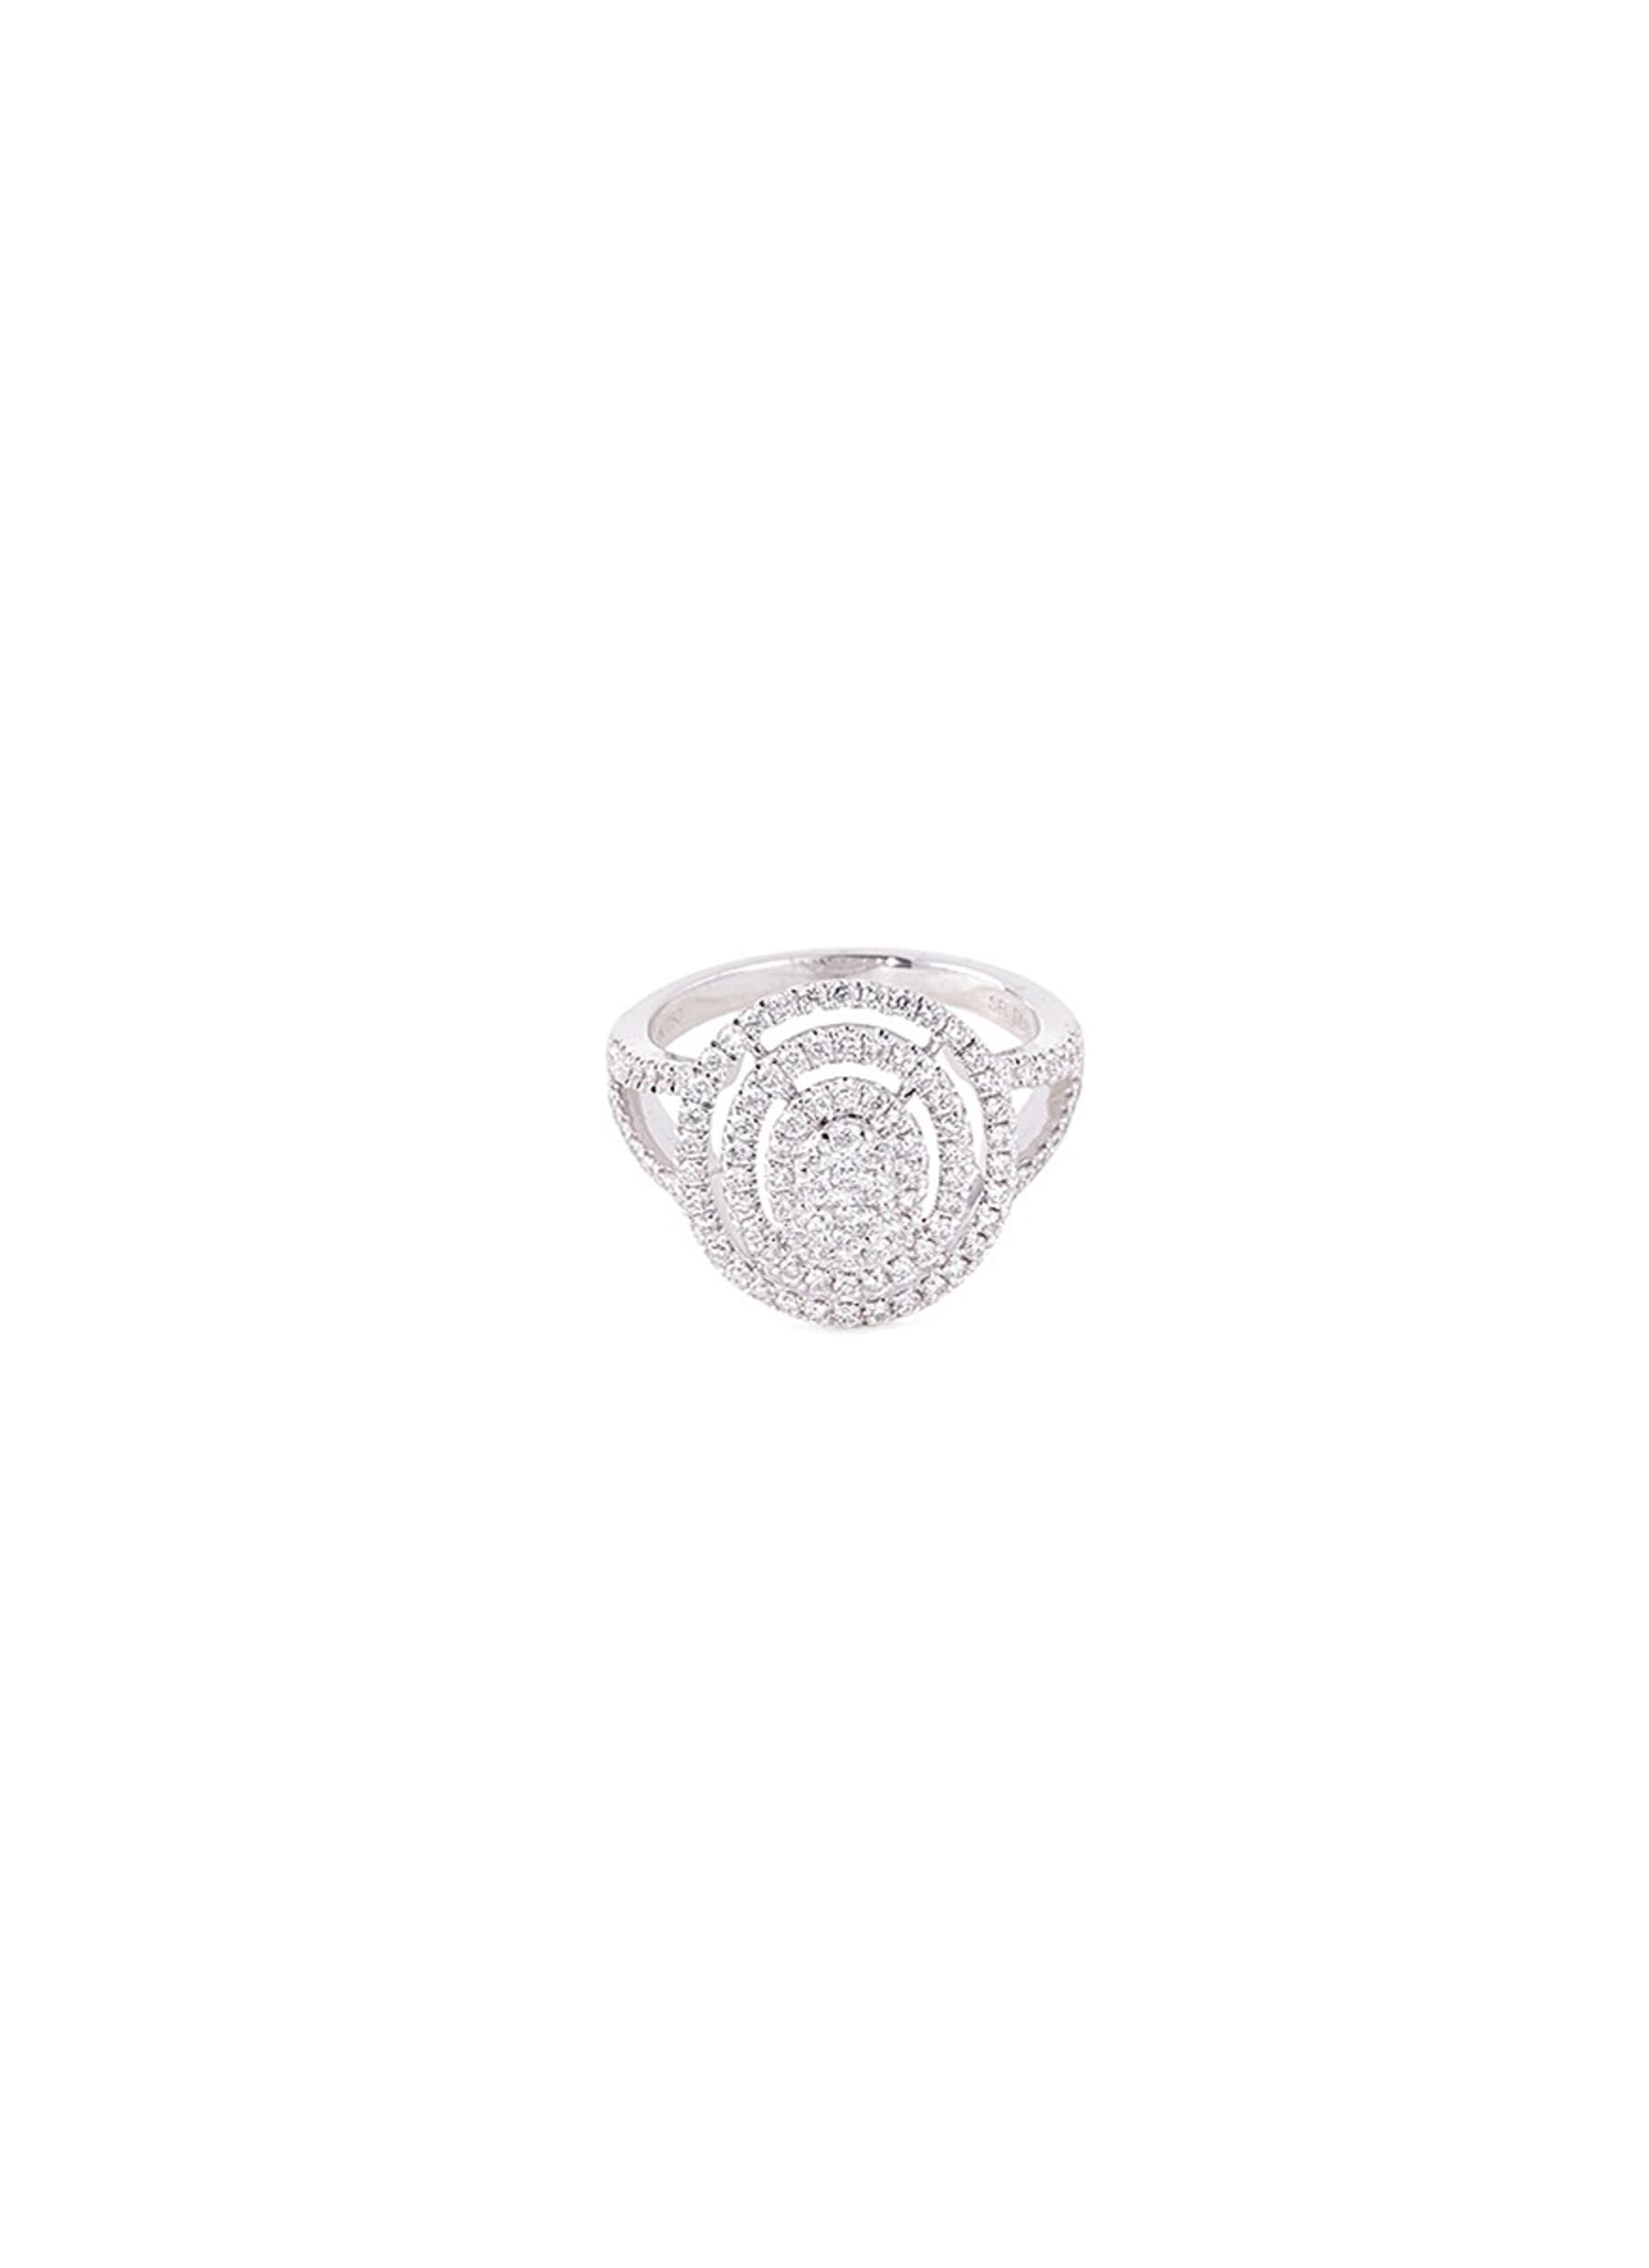 Diamond 18k gold circular cutout ring